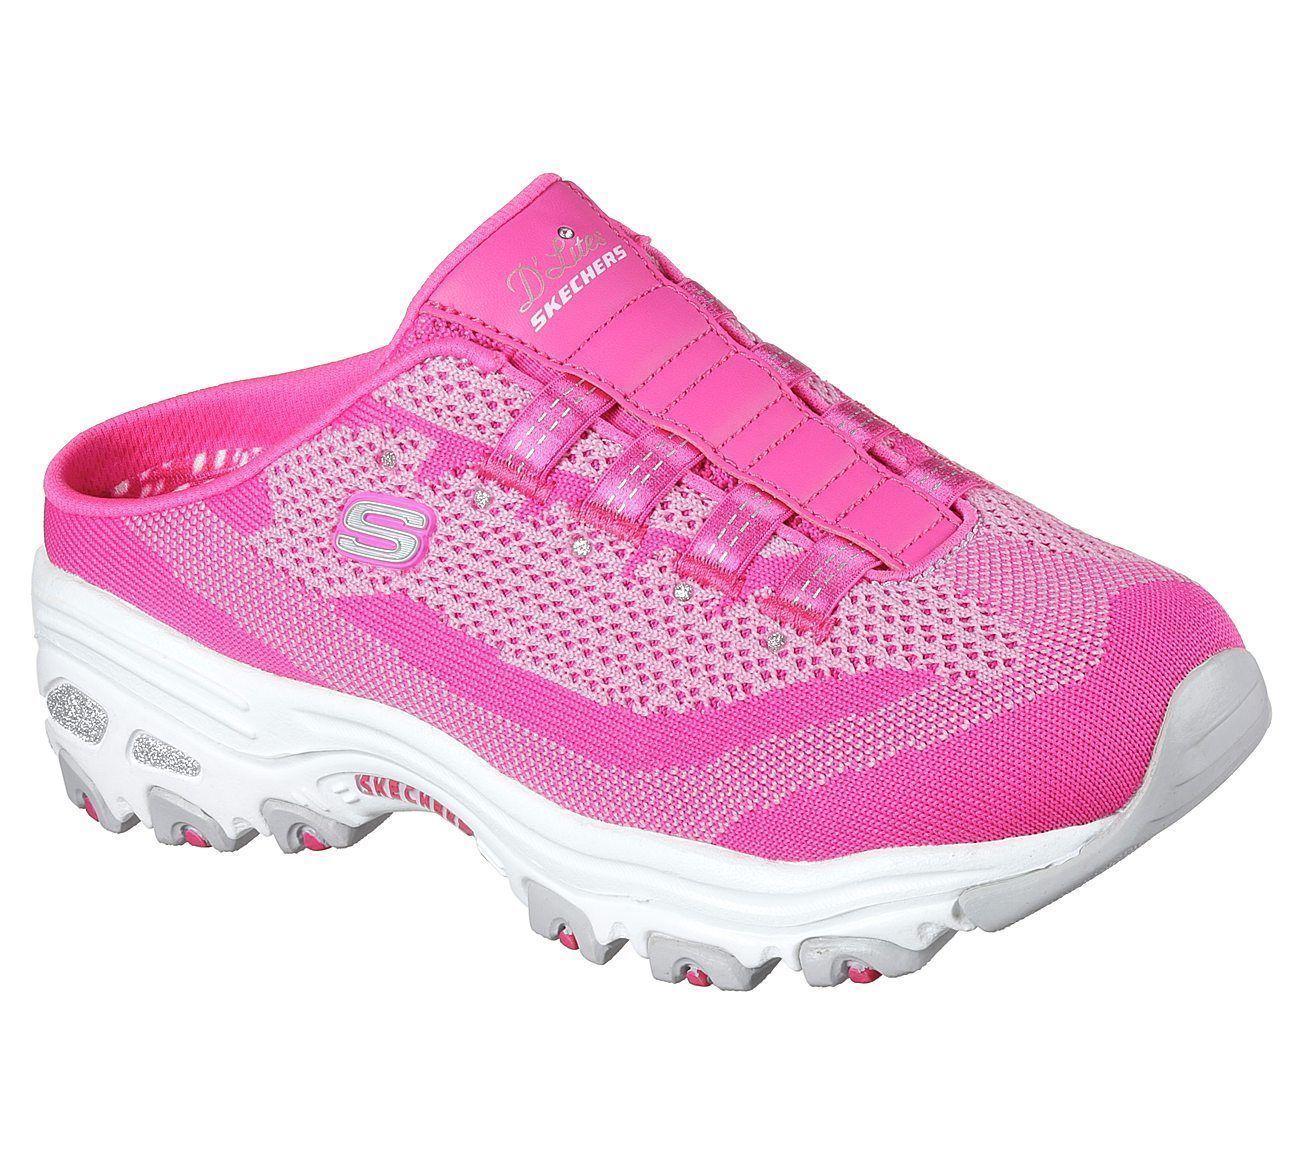 afa8a9a4fe58 ... 11957 Hot Pink Dlites Skechers shoes Women Sport Slip On Clog Casual  Memory Foam